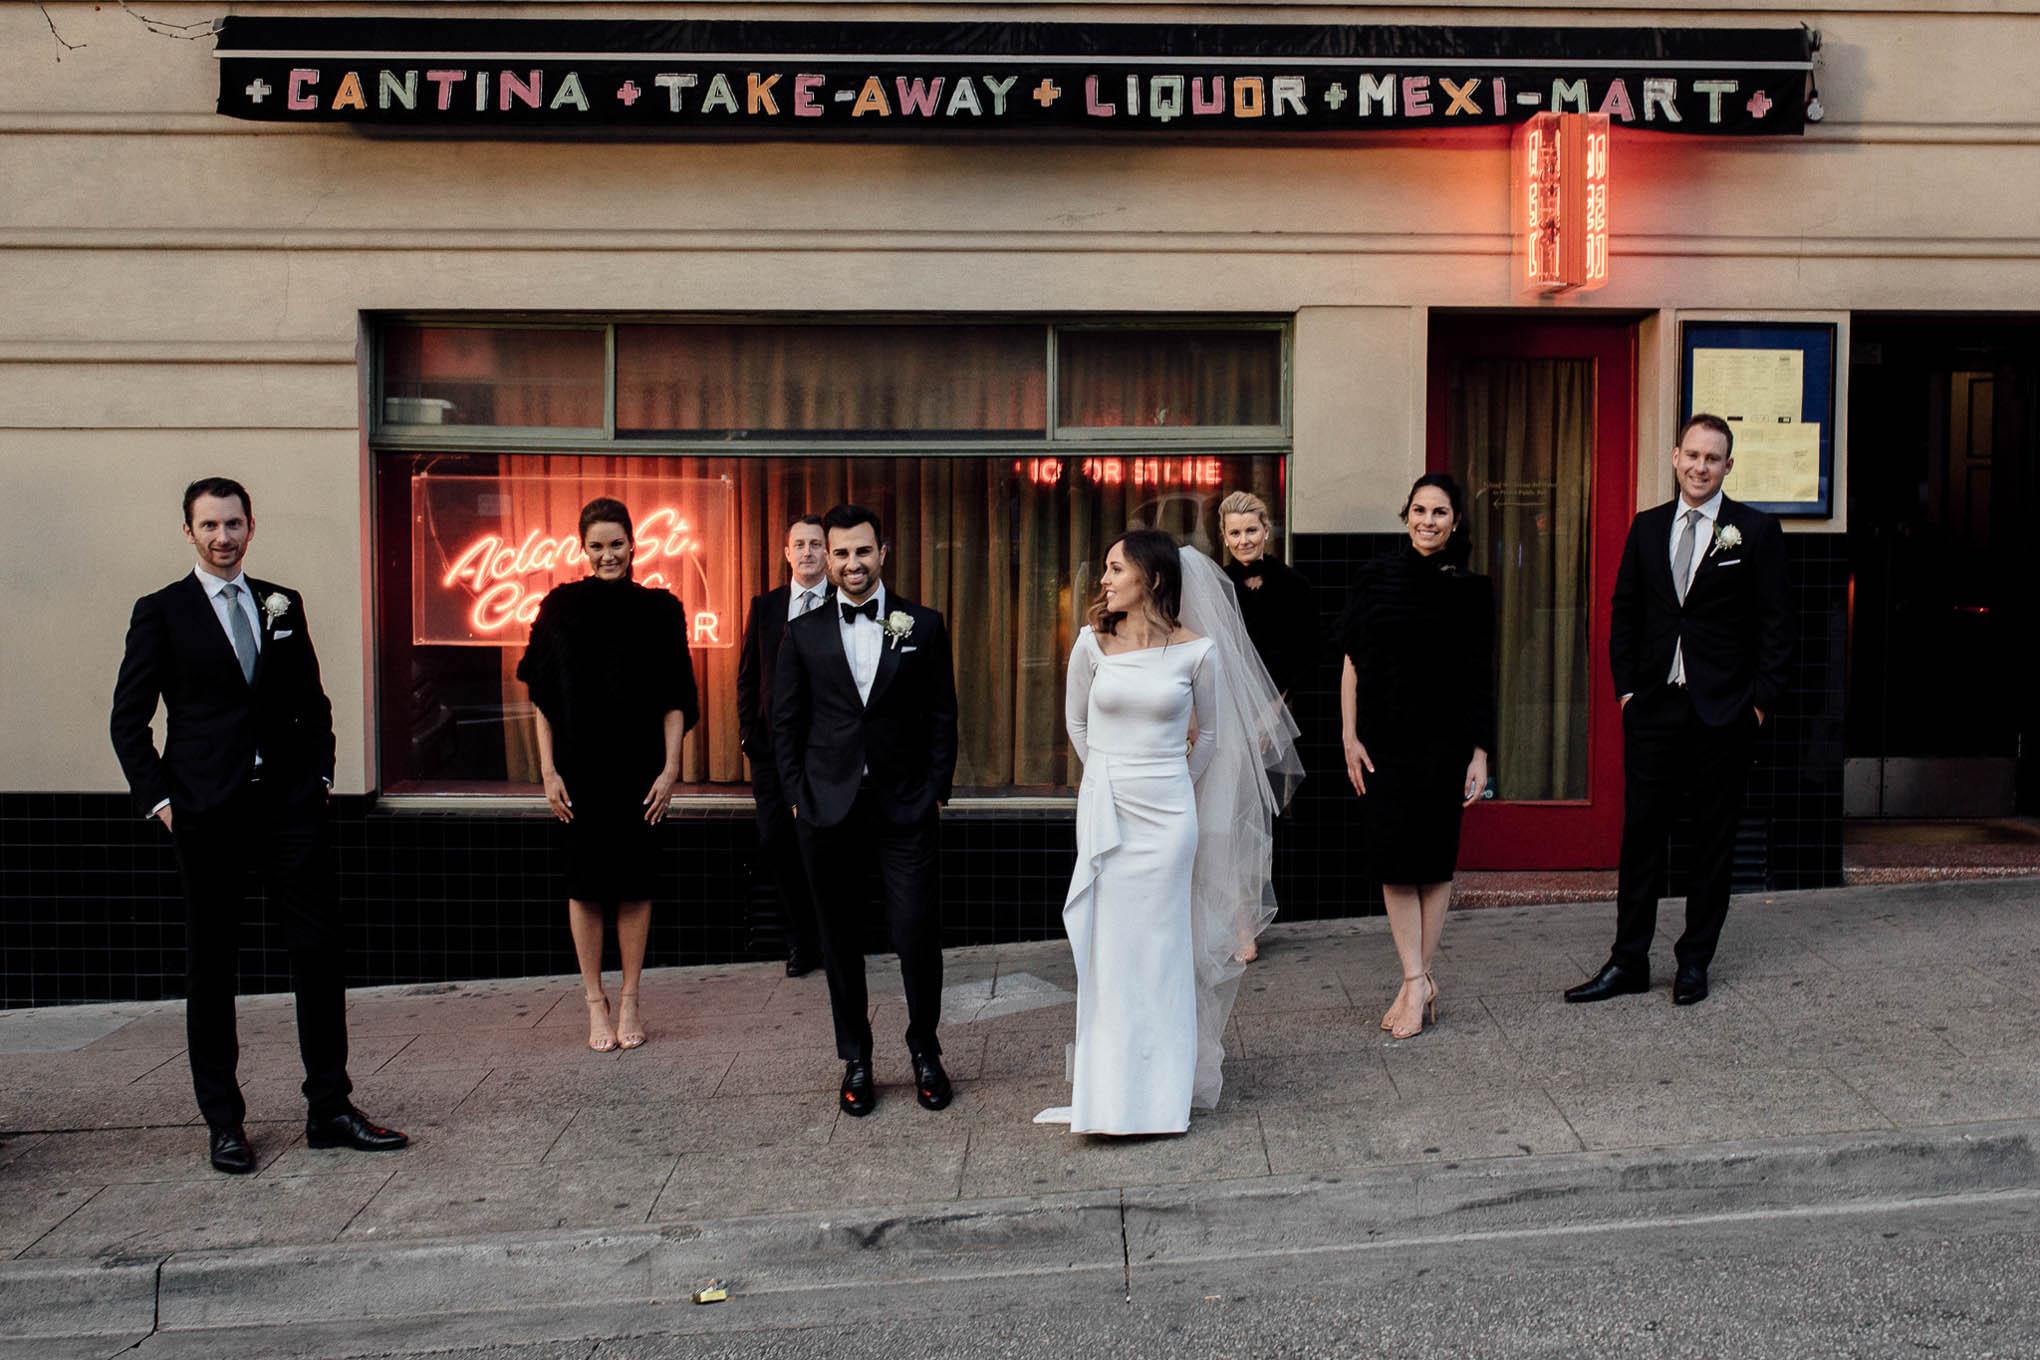 Categories: Weddings-Real Wedding: Tony + Gabby - Photography by Jai at Free the Bird